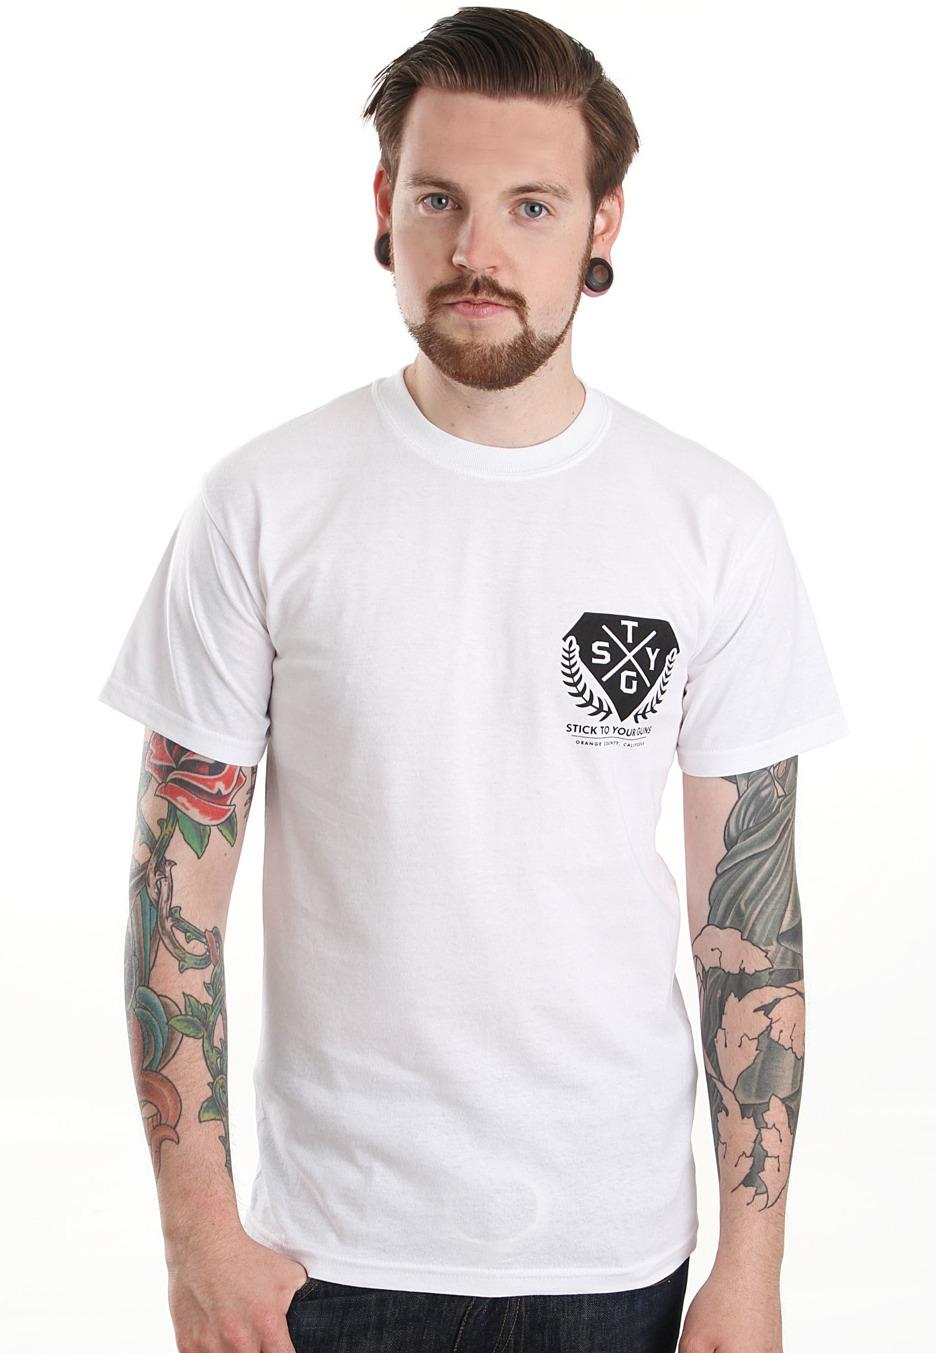 Stick To Your Guns - All Talk No Walk White - T-Shirt Merch Store - Impericon.com UK